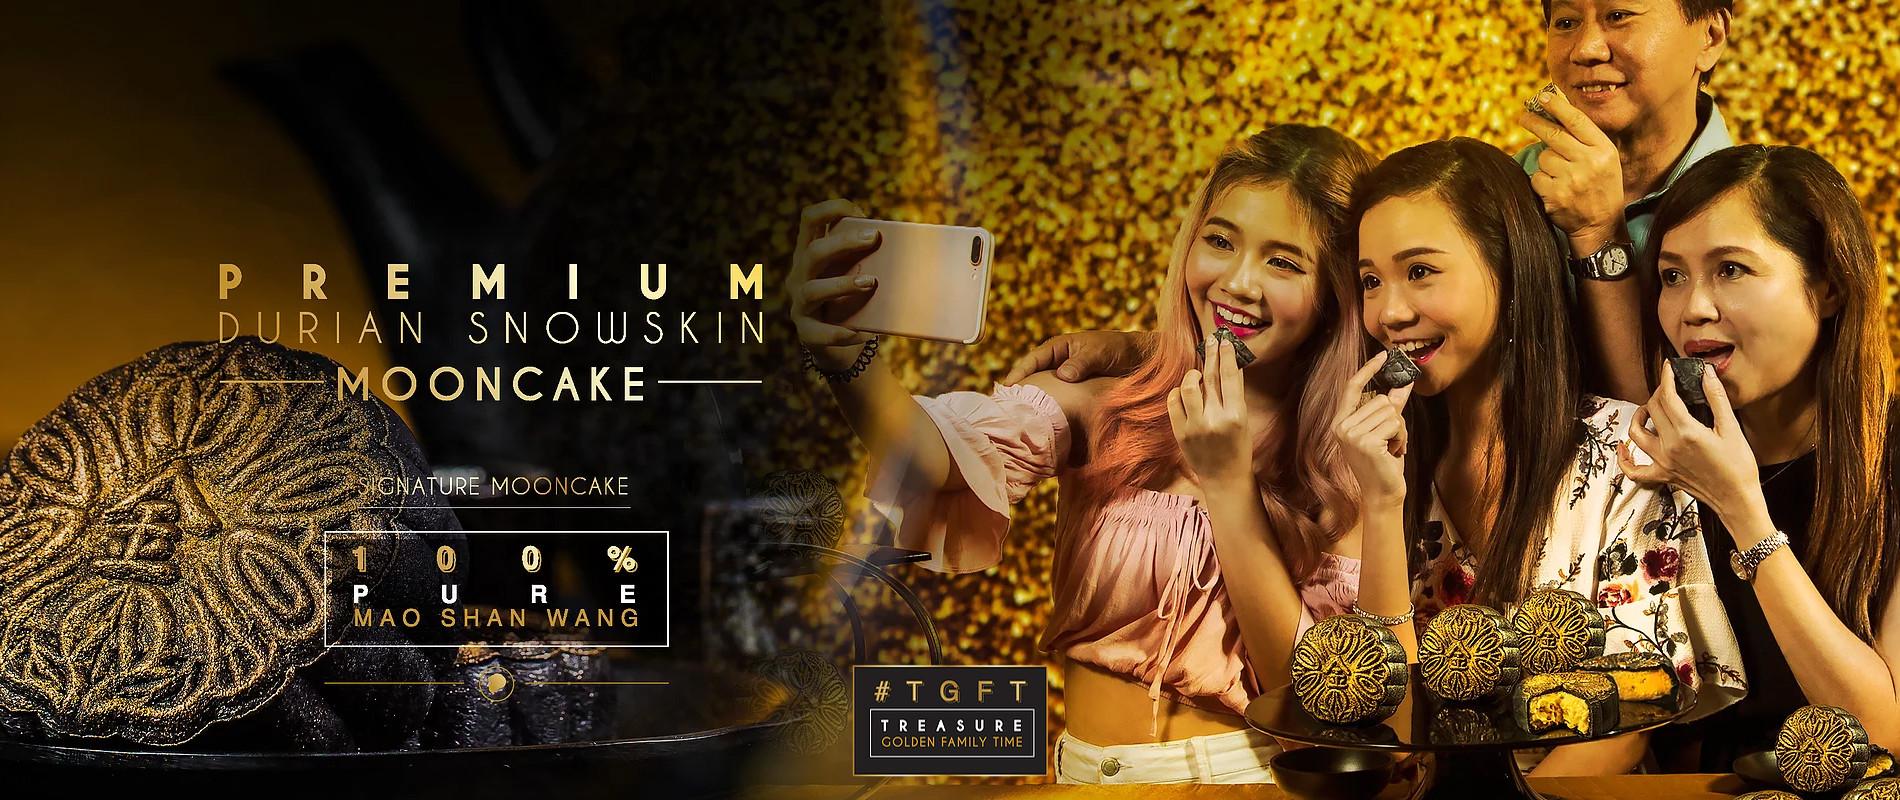 Premium Mao Shan Wang Durian Snowskin Mooncake